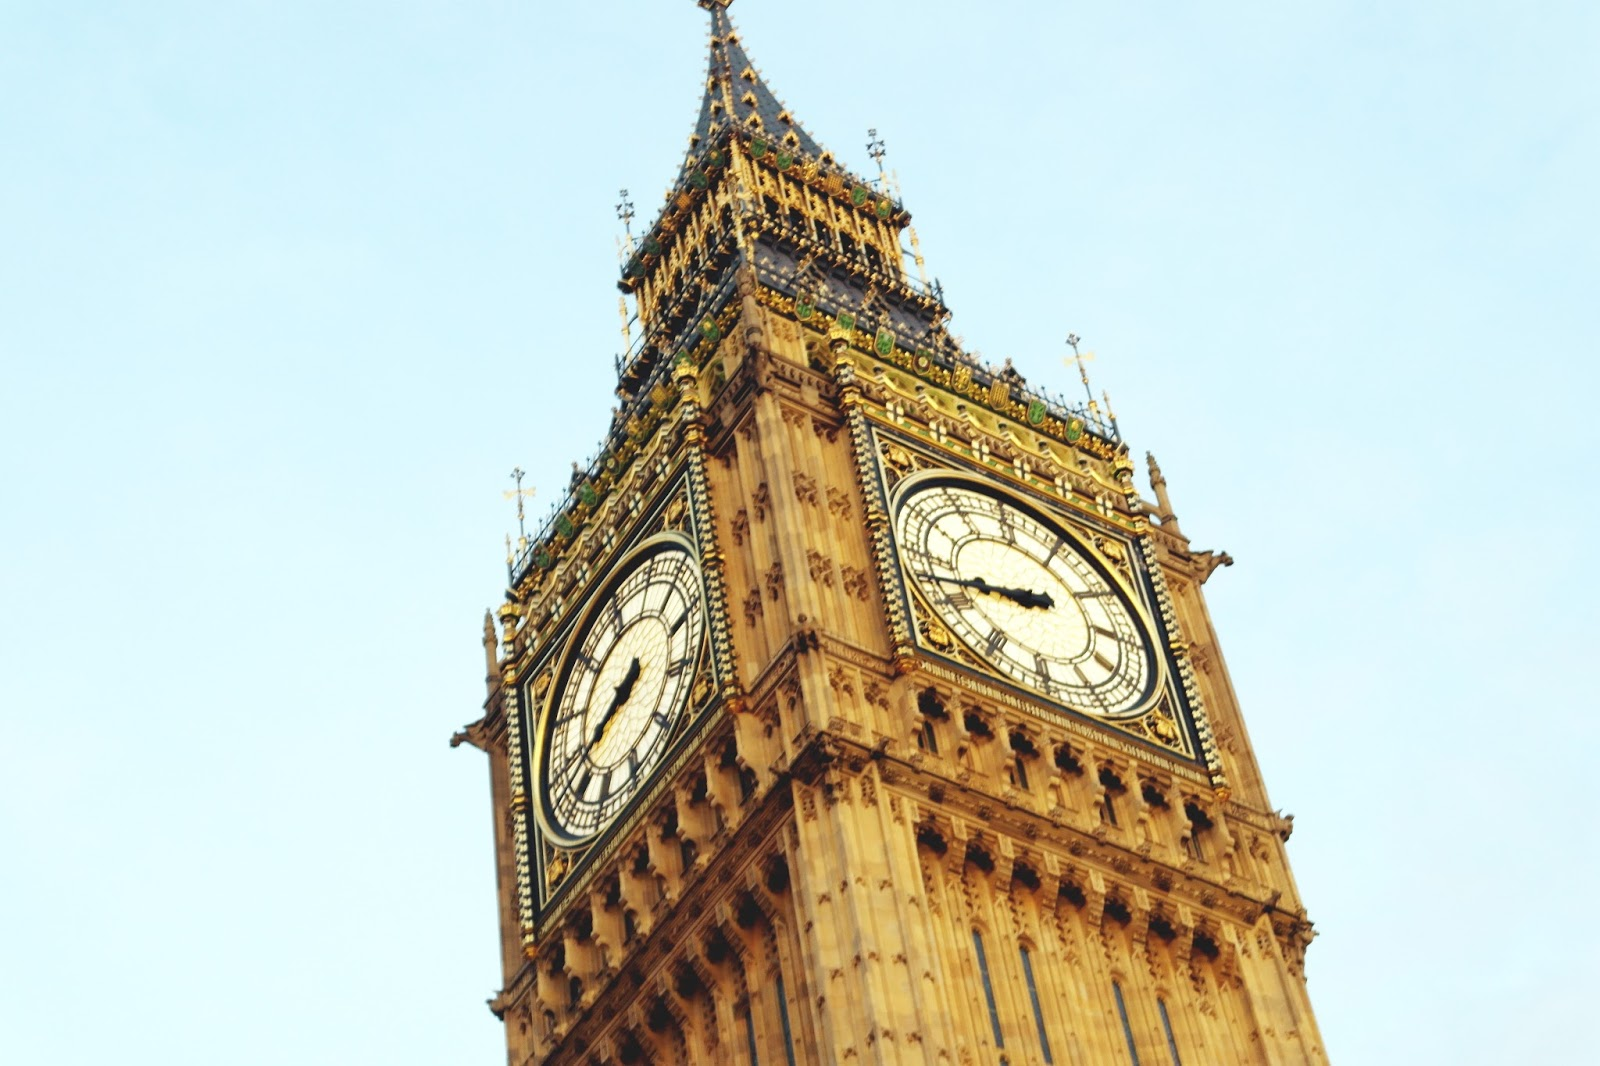 St. Elizabeth's Tower